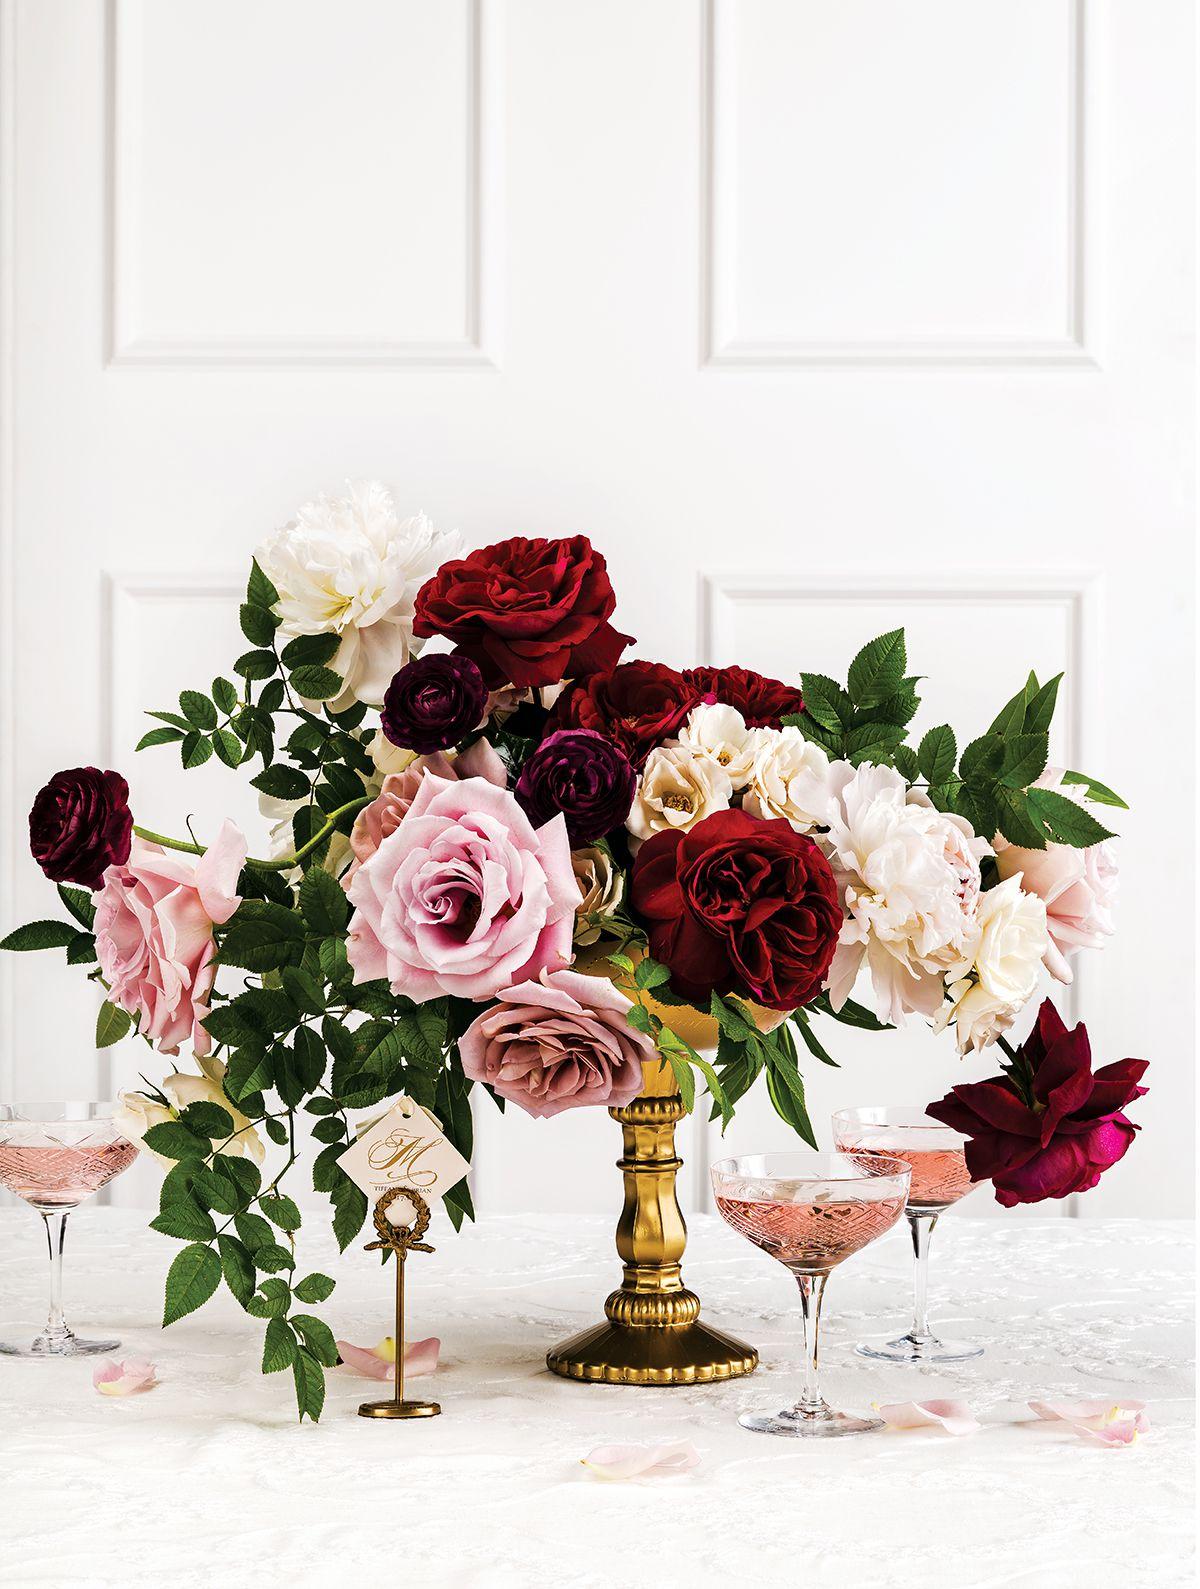 Wondrous 15 In Season Winter Wedding Flowers Download Free Architecture Designs Crovemadebymaigaardcom